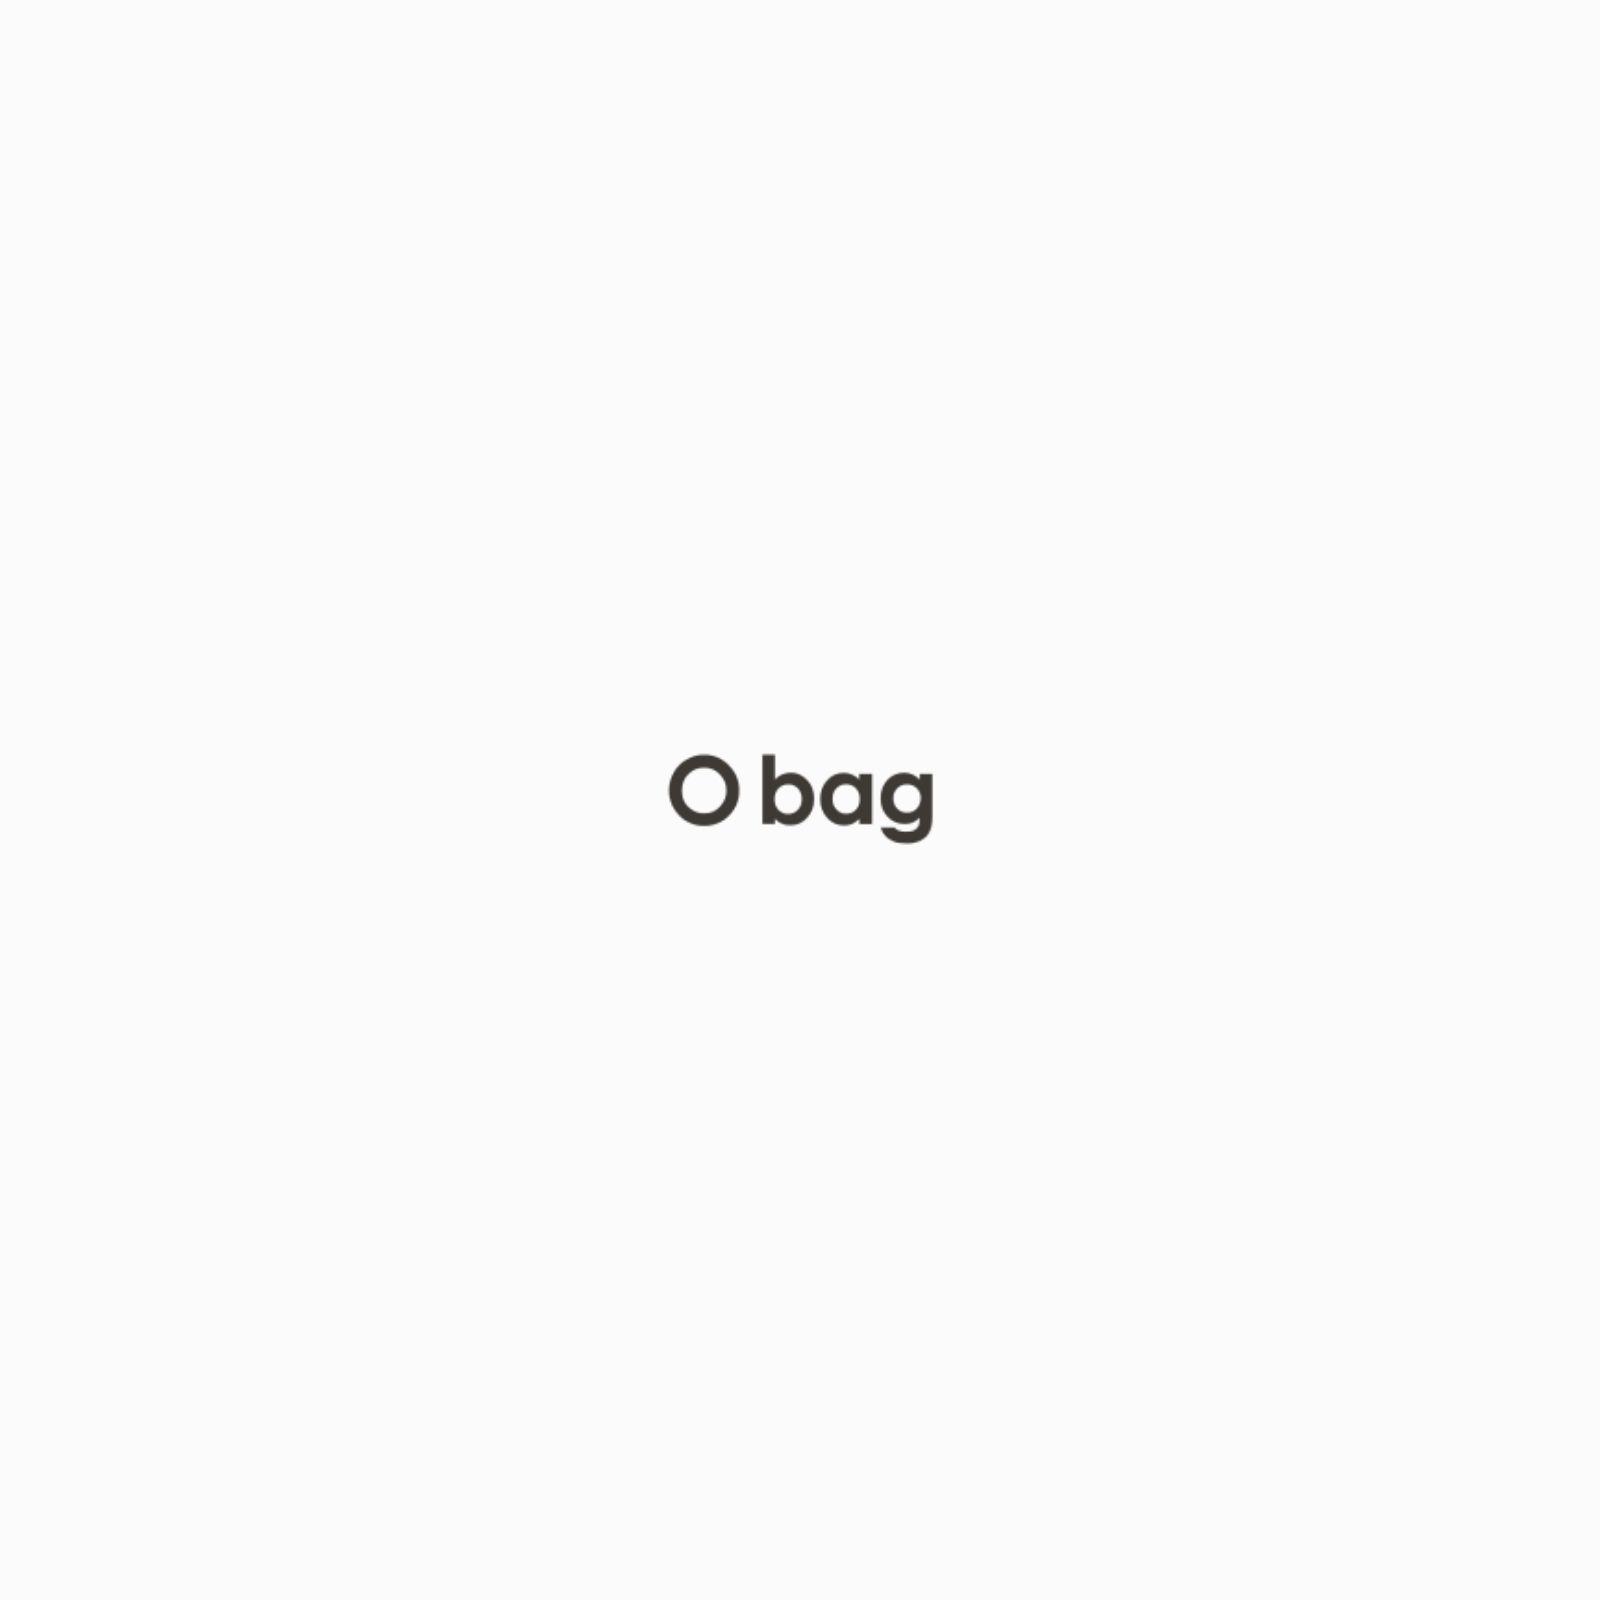 3ae056c764 O bag Borsa classica